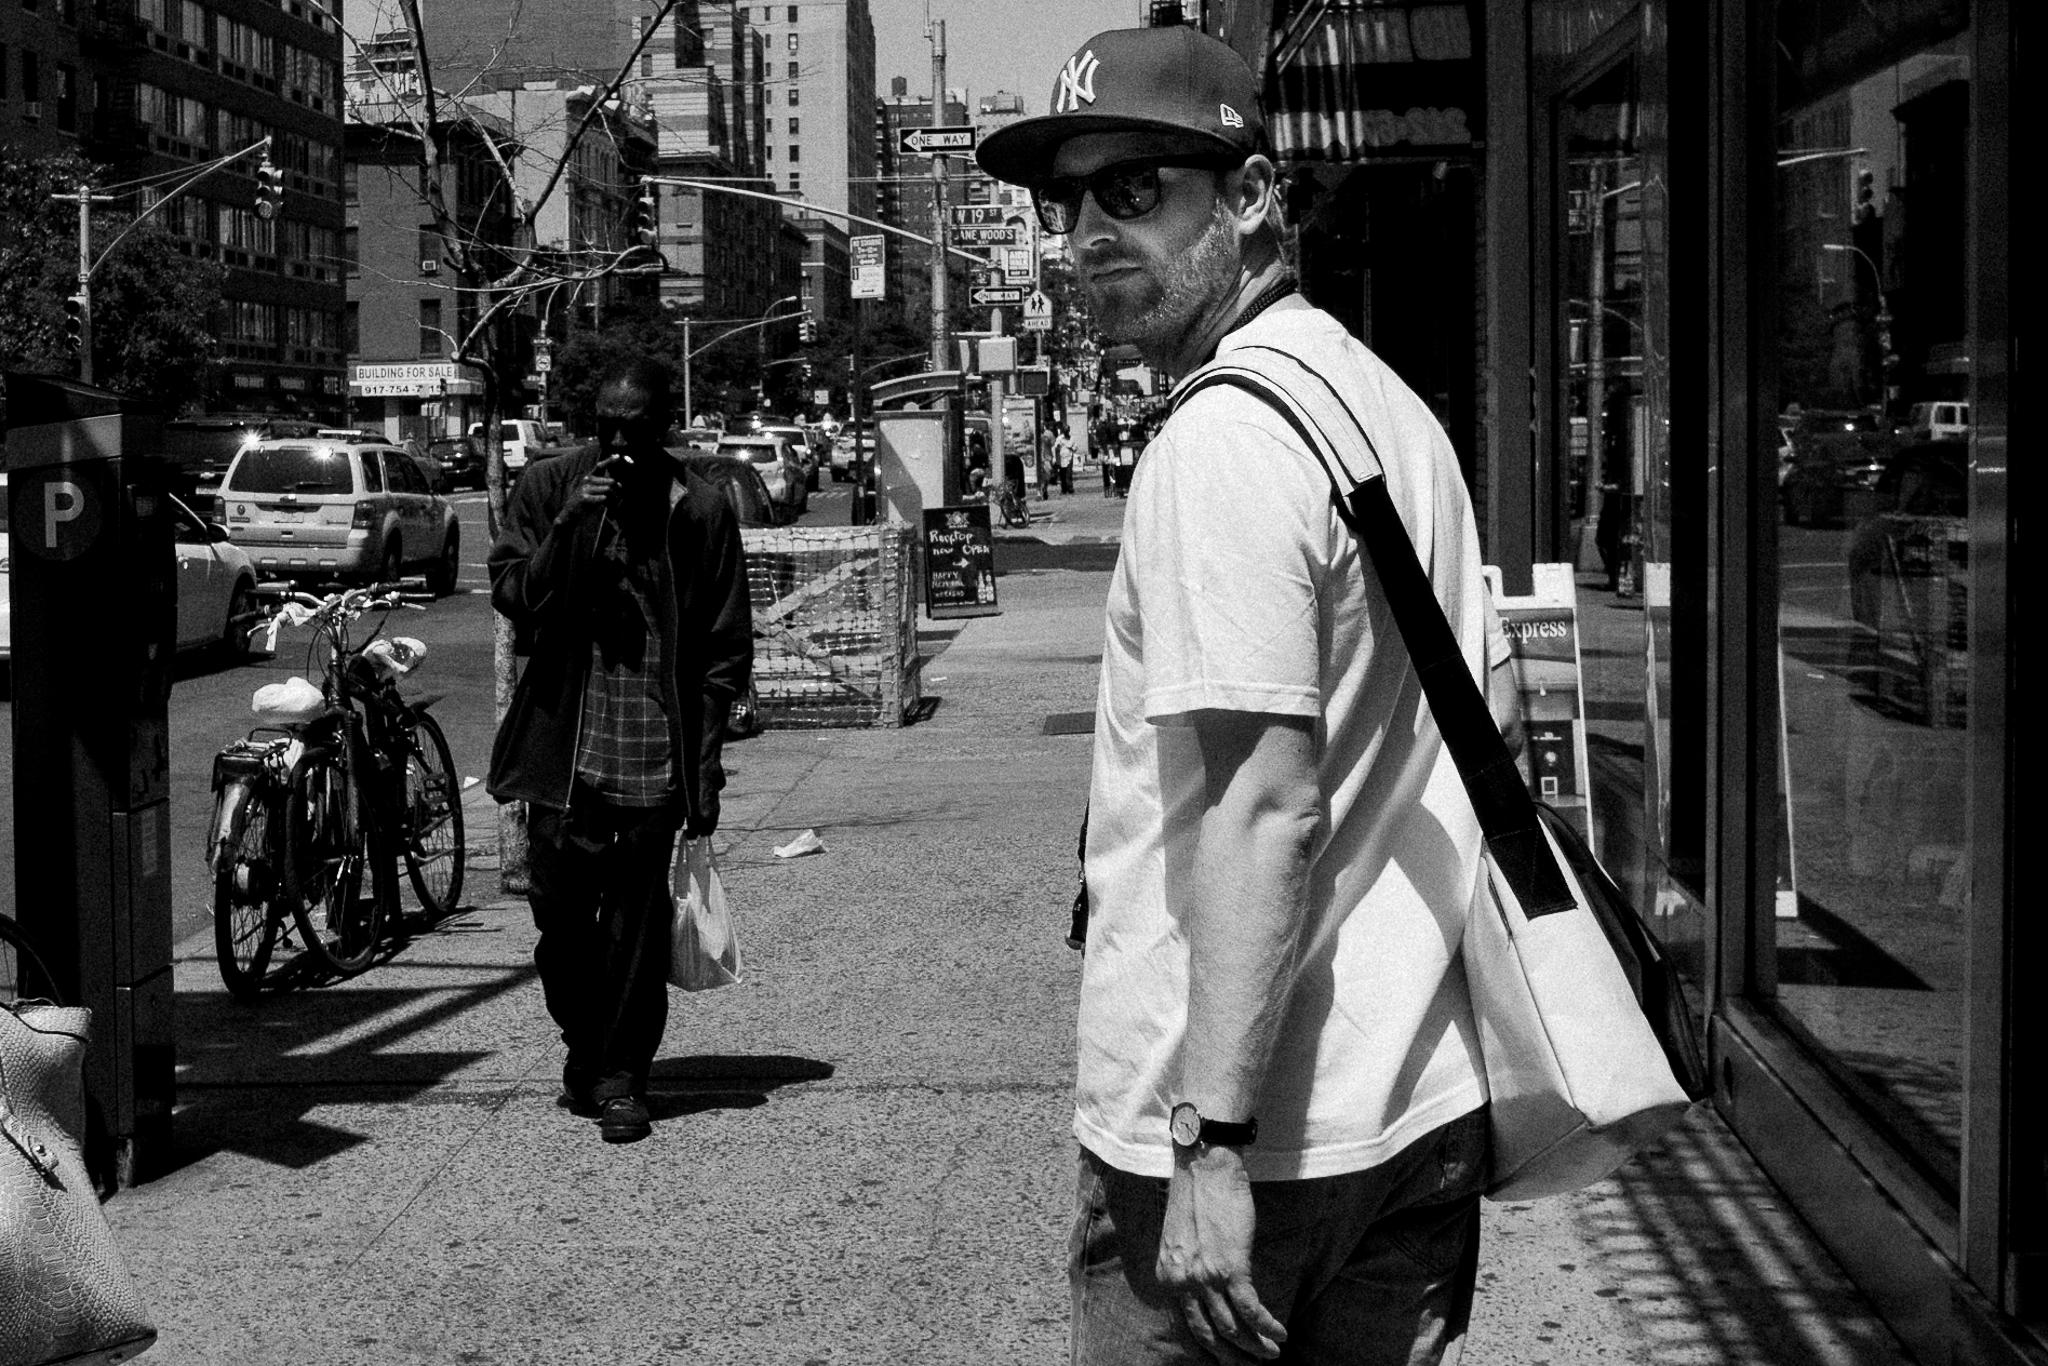 2015-05-14-NYC-4648.jpg